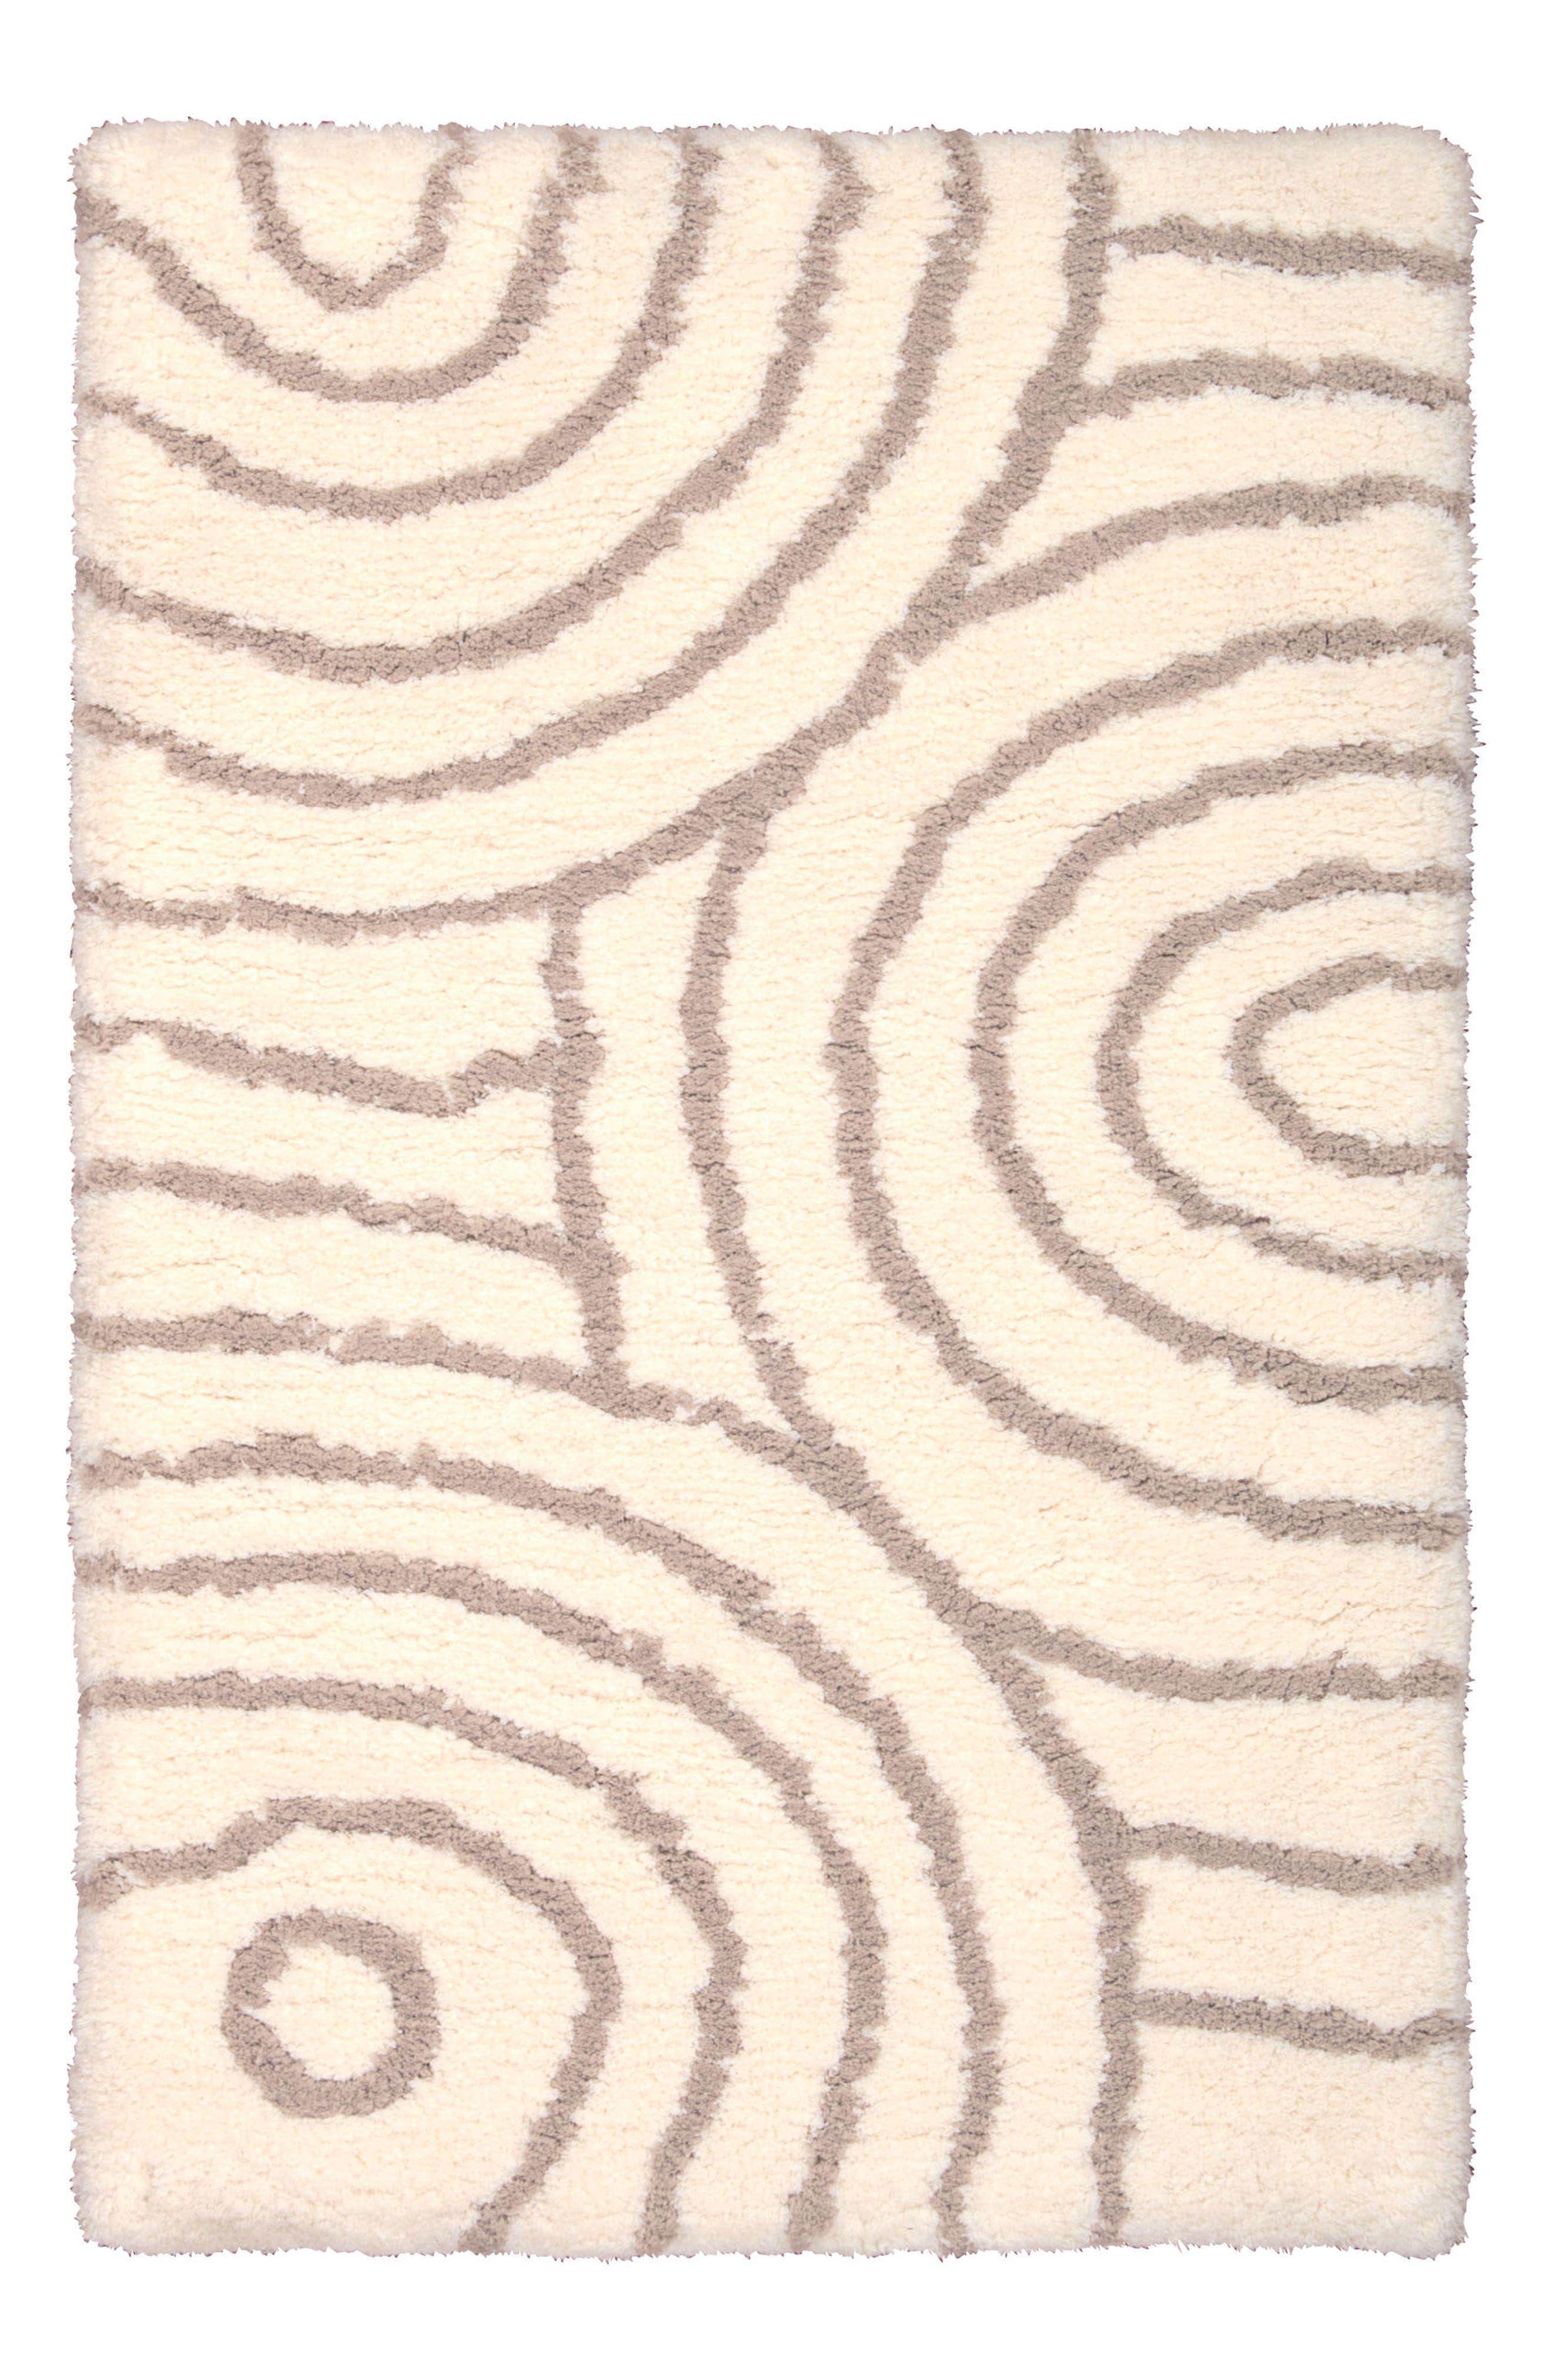 Spiral Rug,                         Main,                         color, Ivory/ Tan